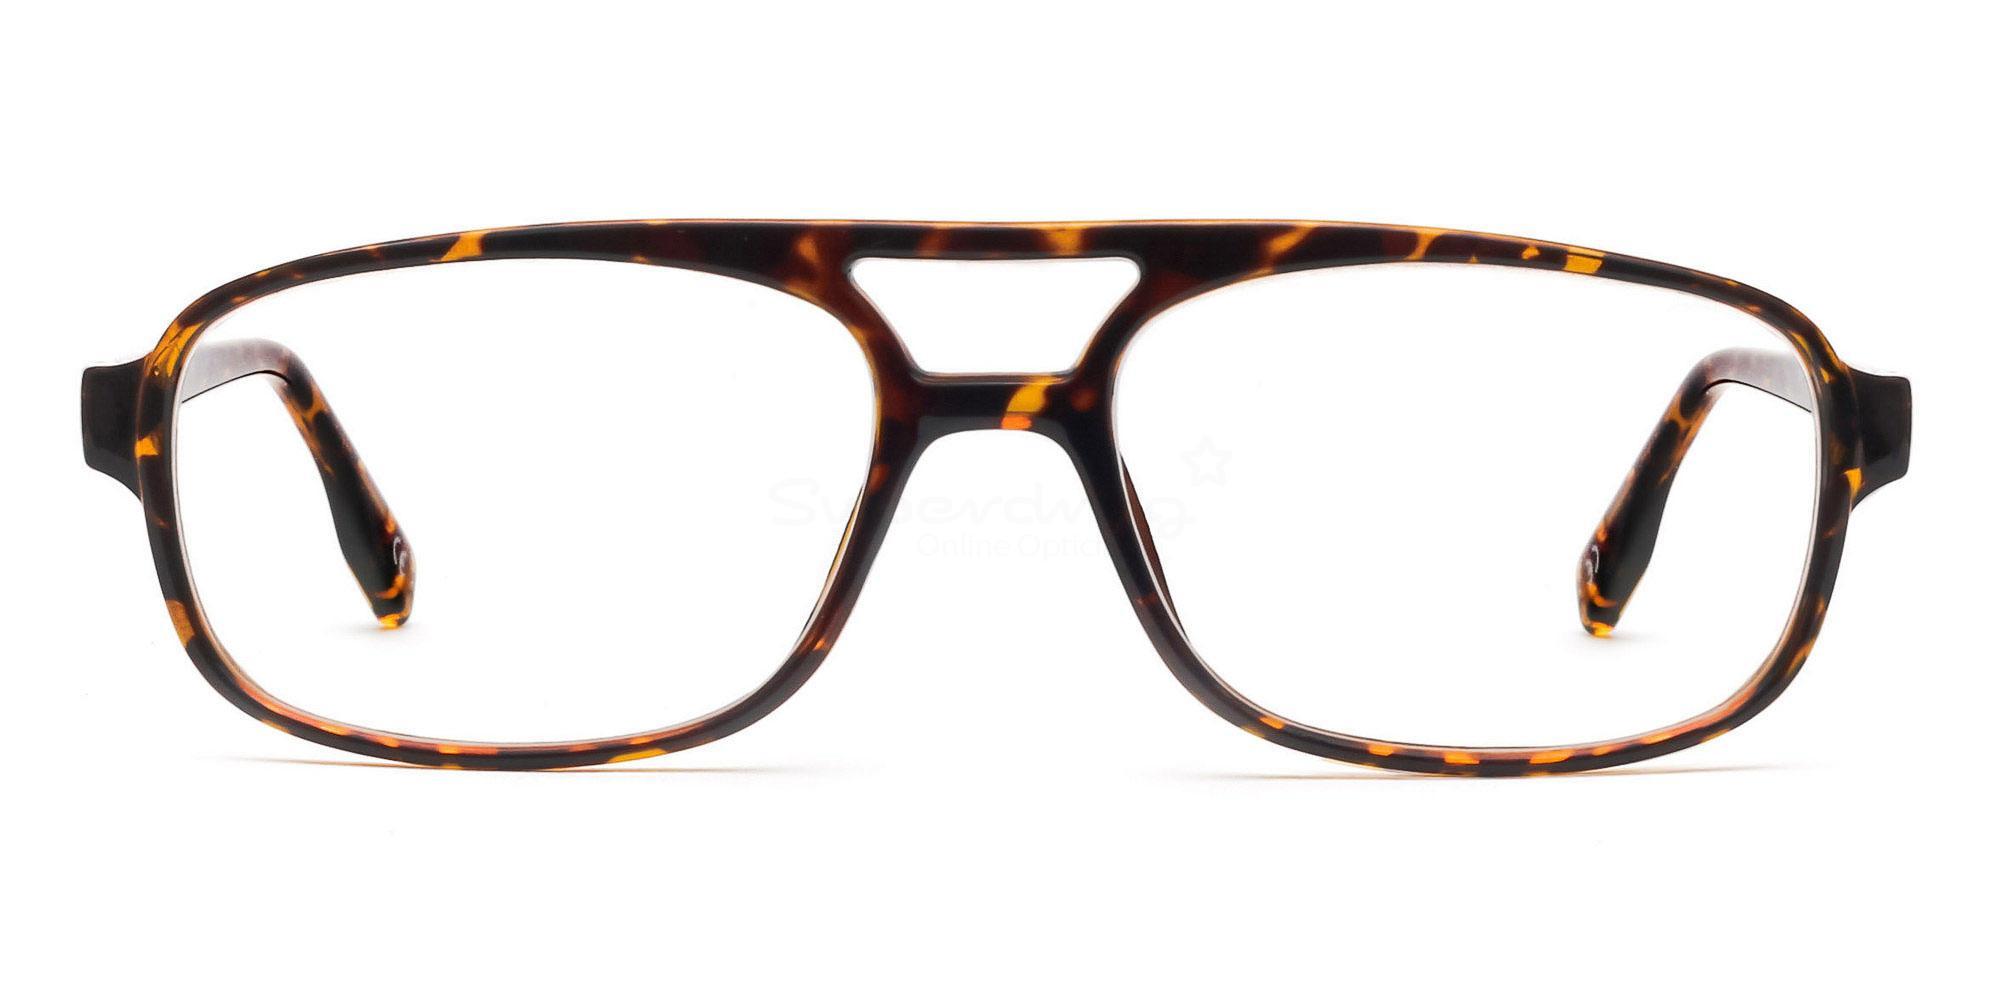 Demi P2395 - Demi Glasses, Helium